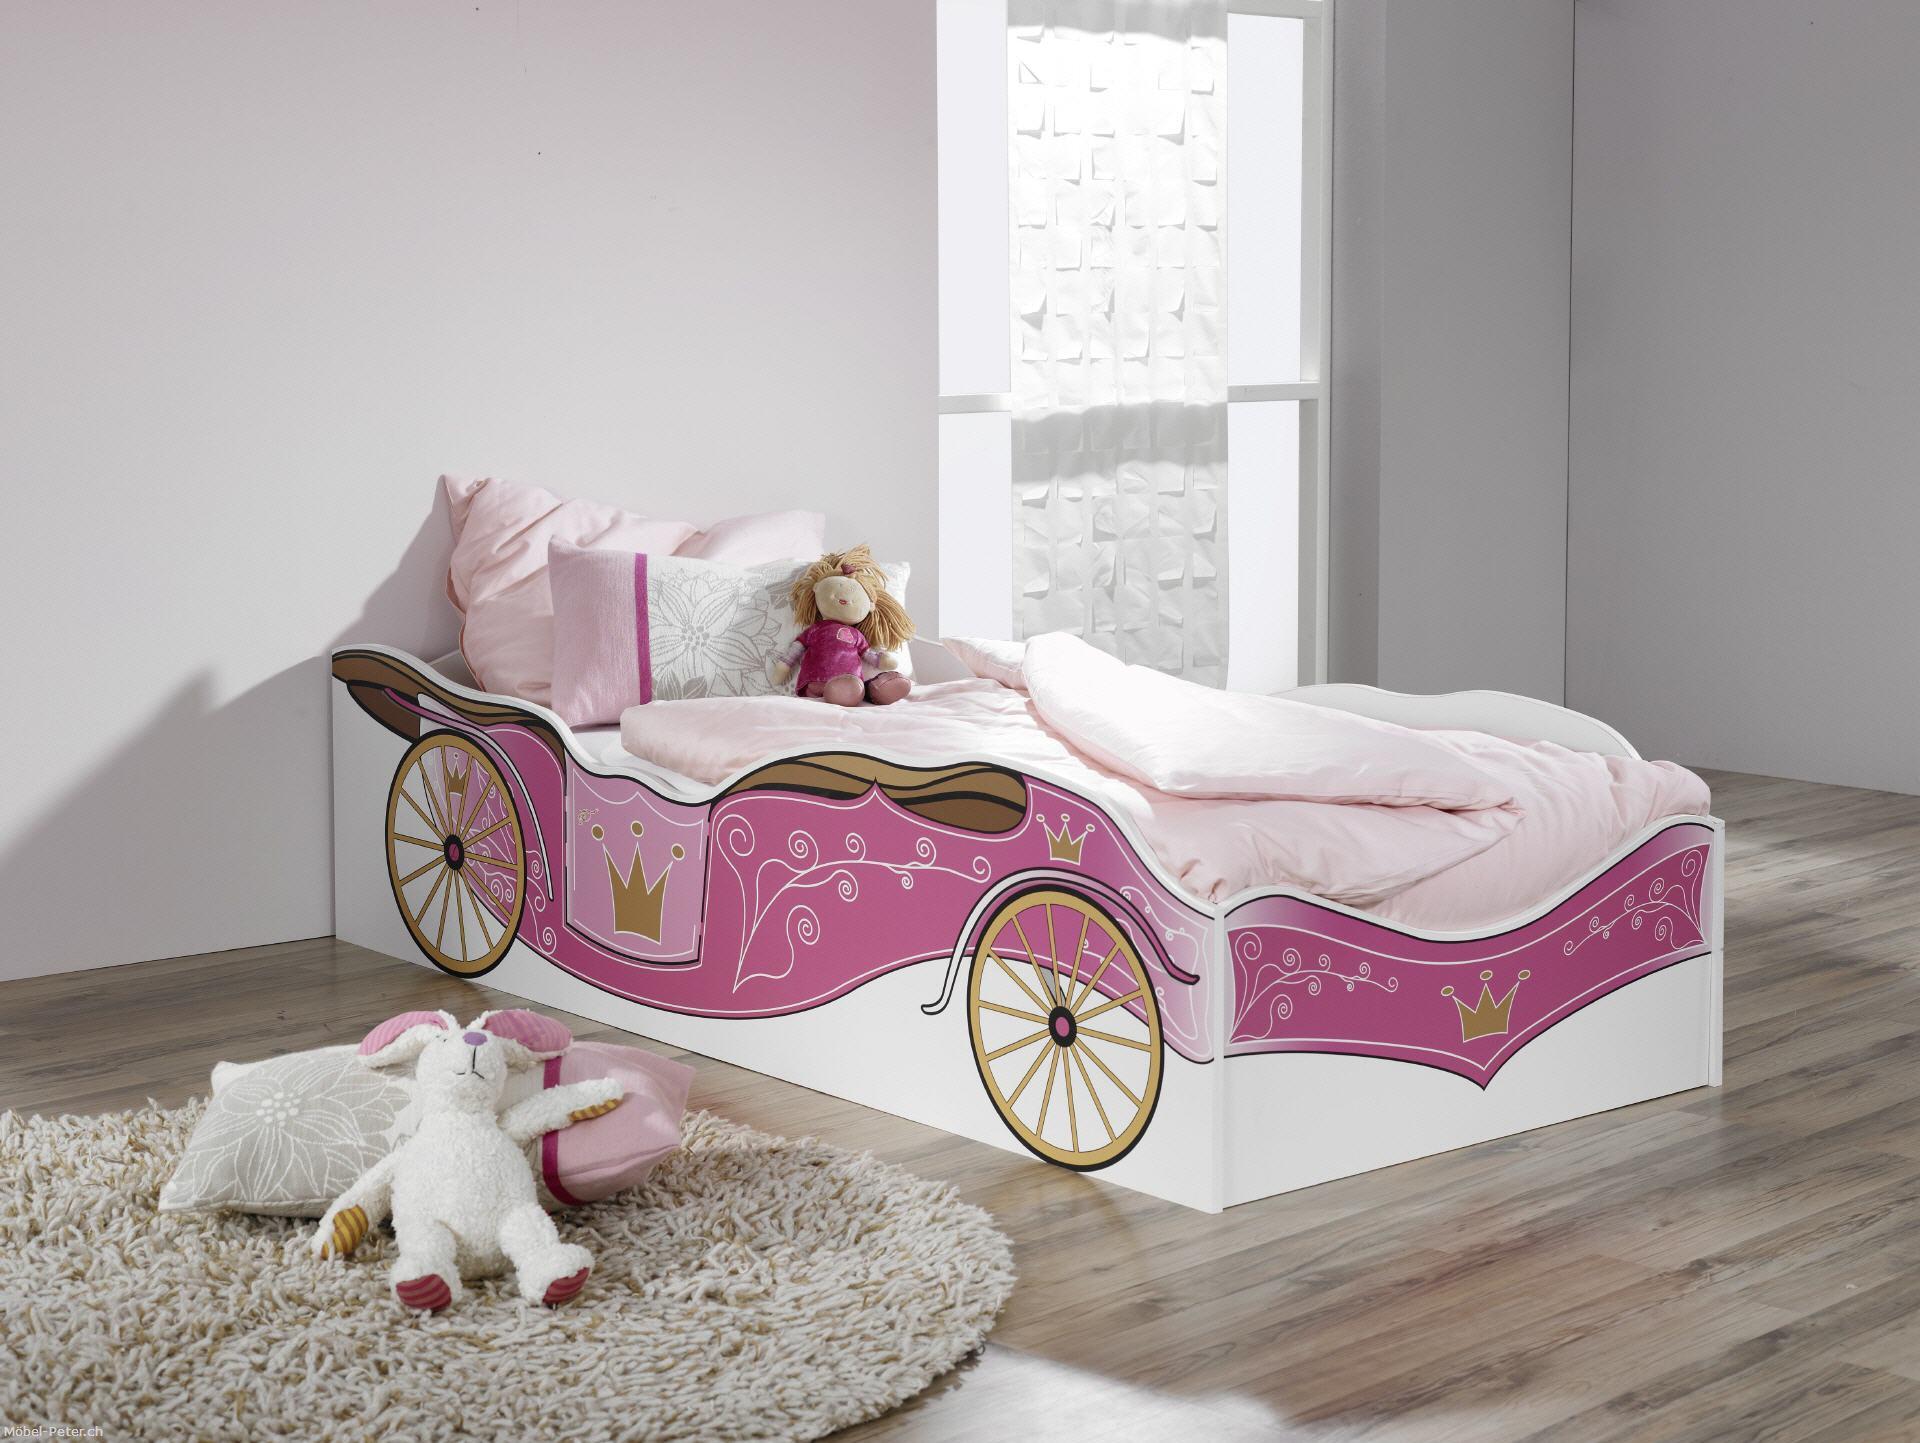 Full Size of Kinderzimmer Prinzessin Lillifee Schloss Deko Karolin Komplett Babyzimmer Playmobil Bett Prinzessinnen Prinzessinen Regal Weiß Regale Sofa Kinderzimmer Kinderzimmer Prinzessin